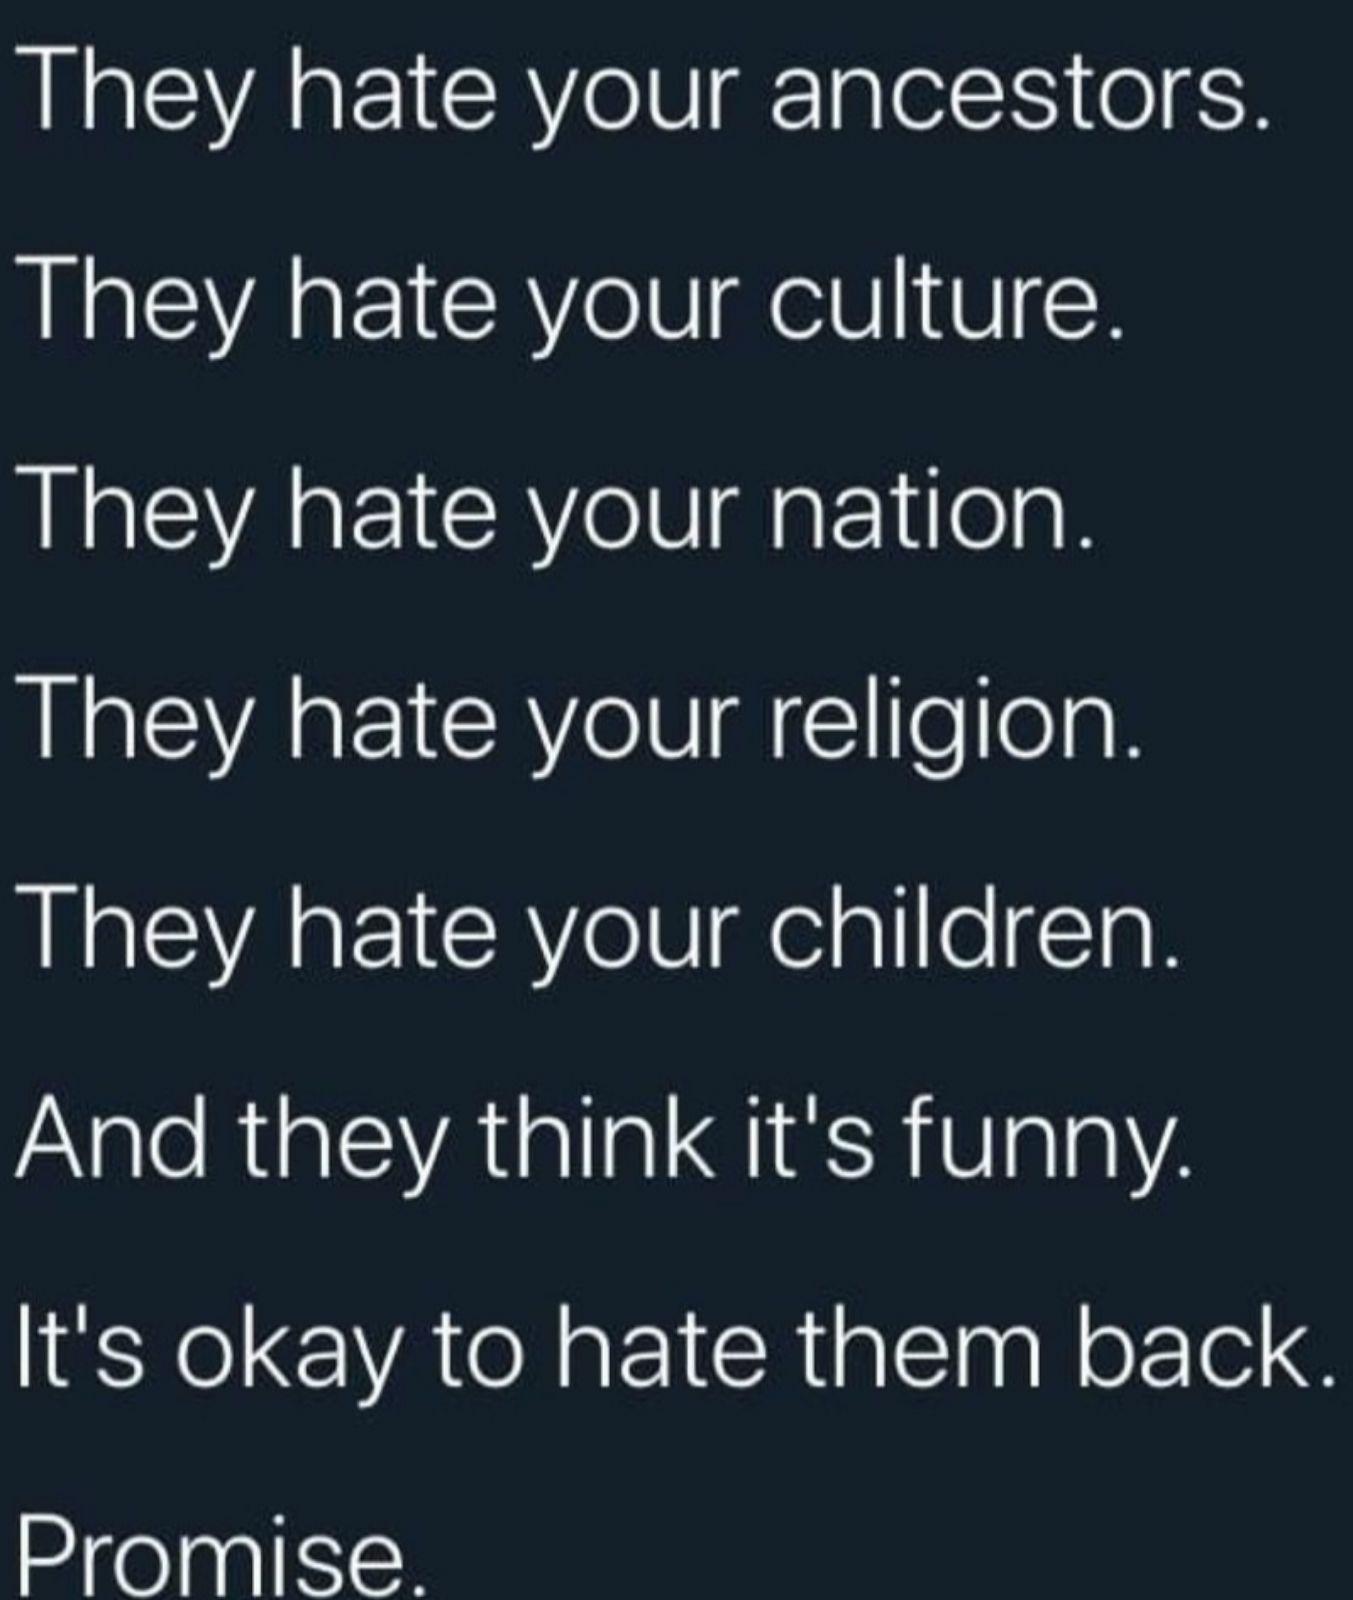 Let the hate flow both ways. - meme